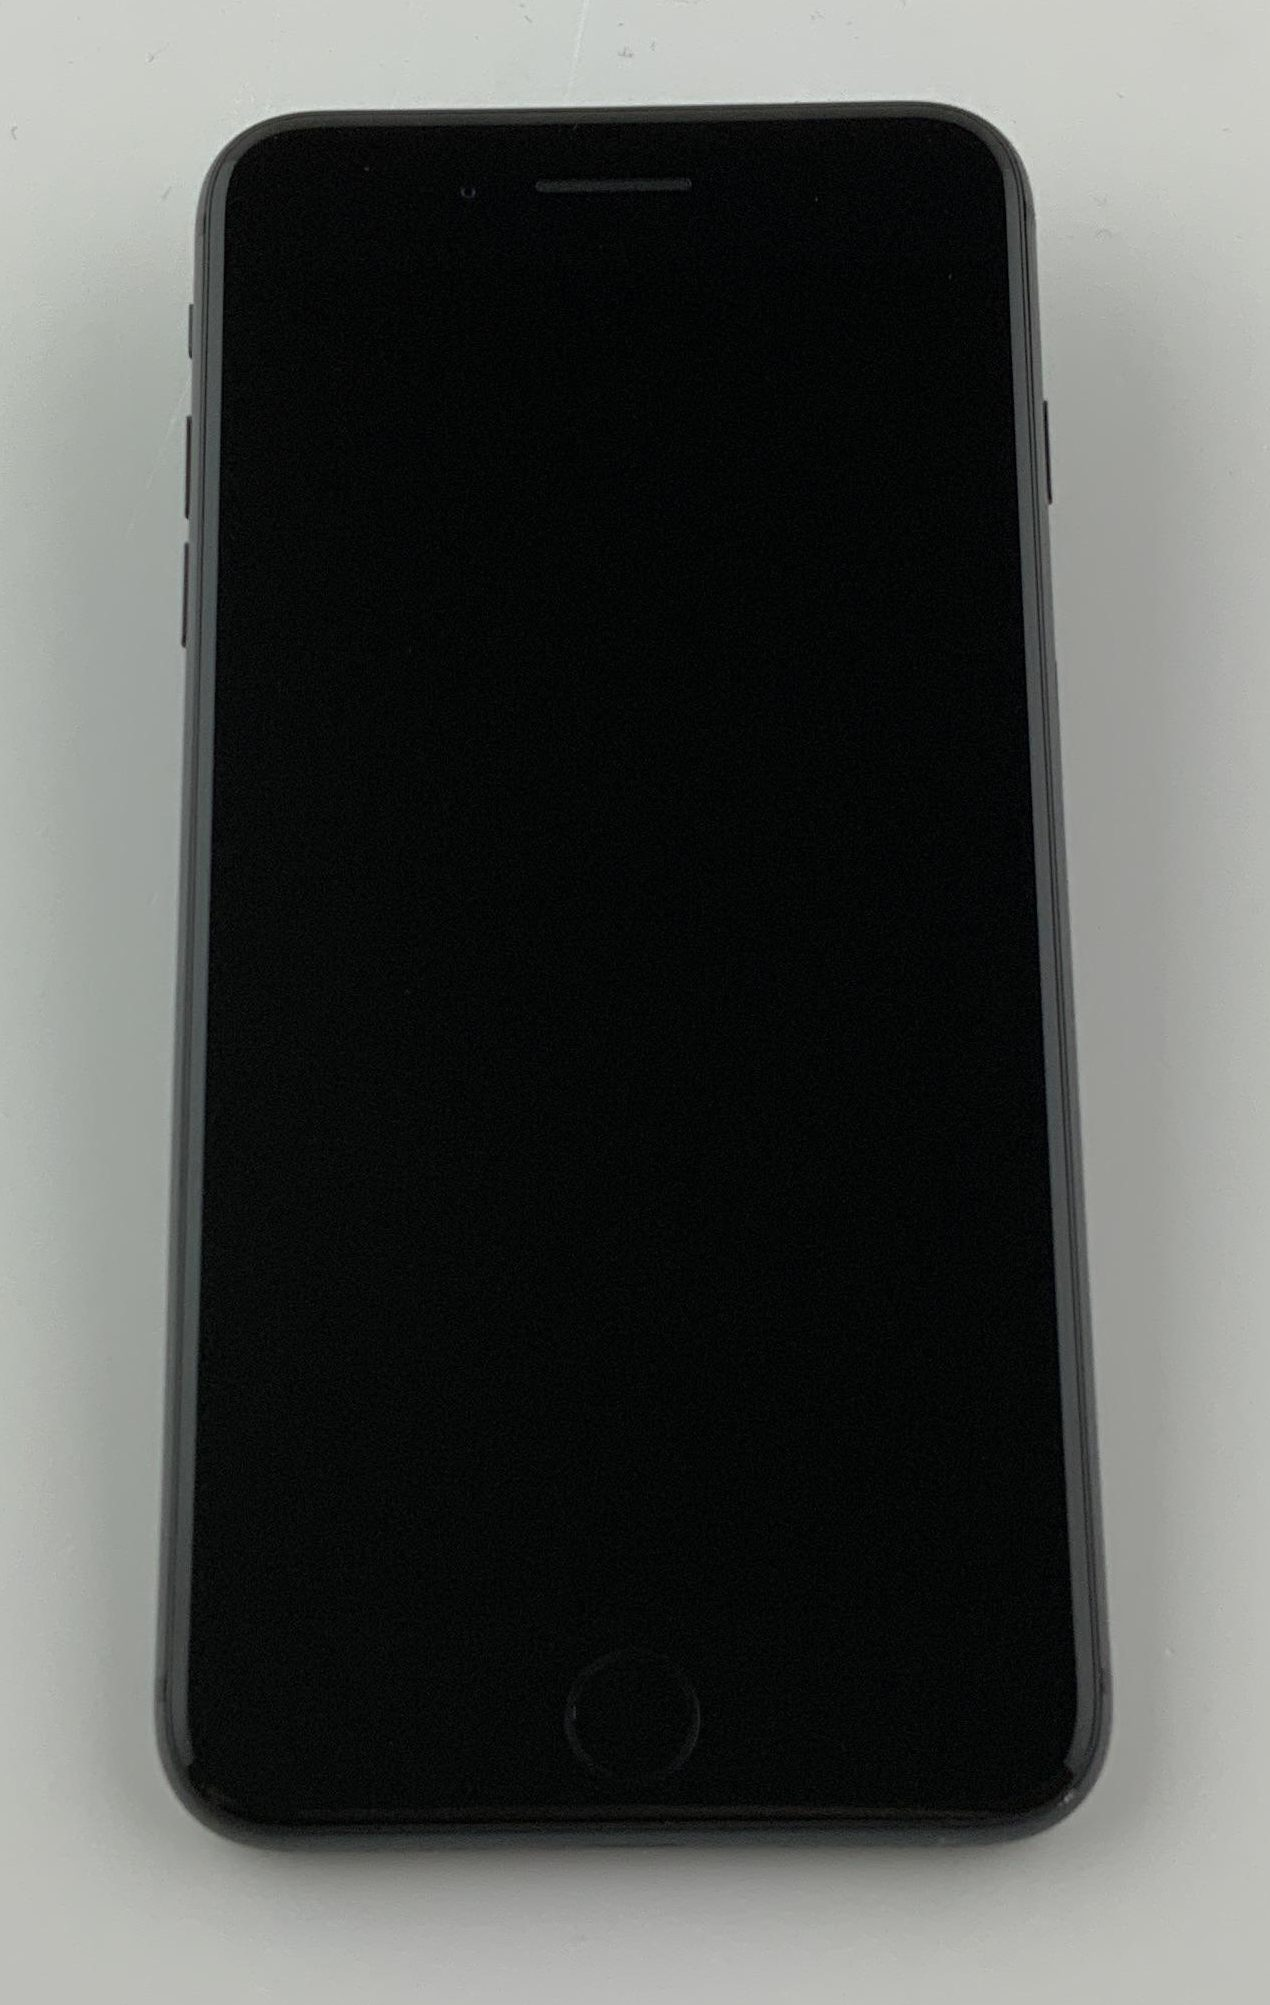 iPhone 8 Plus 256GB, 256GB, Space Gray, immagine 1